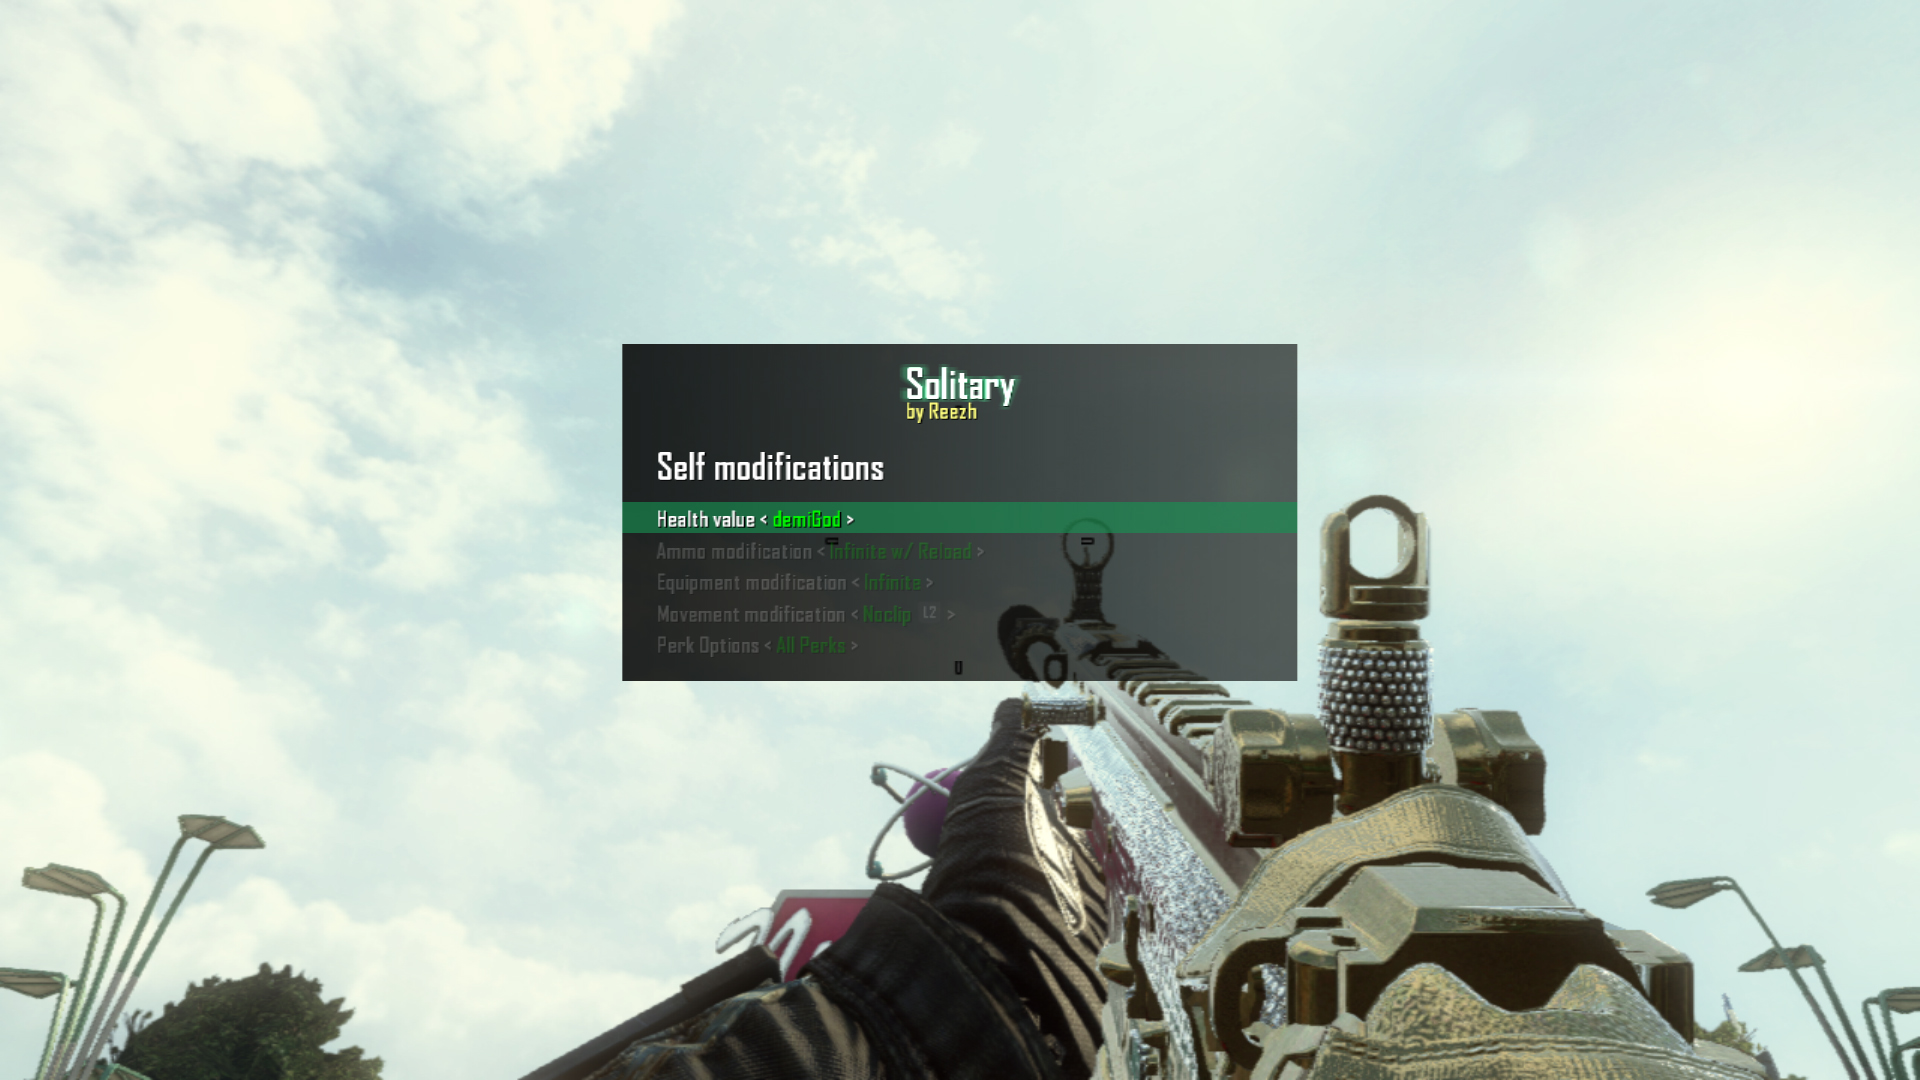 Release - Call of Duty: Black Ops 2 GSC/GSCR Mod Menu